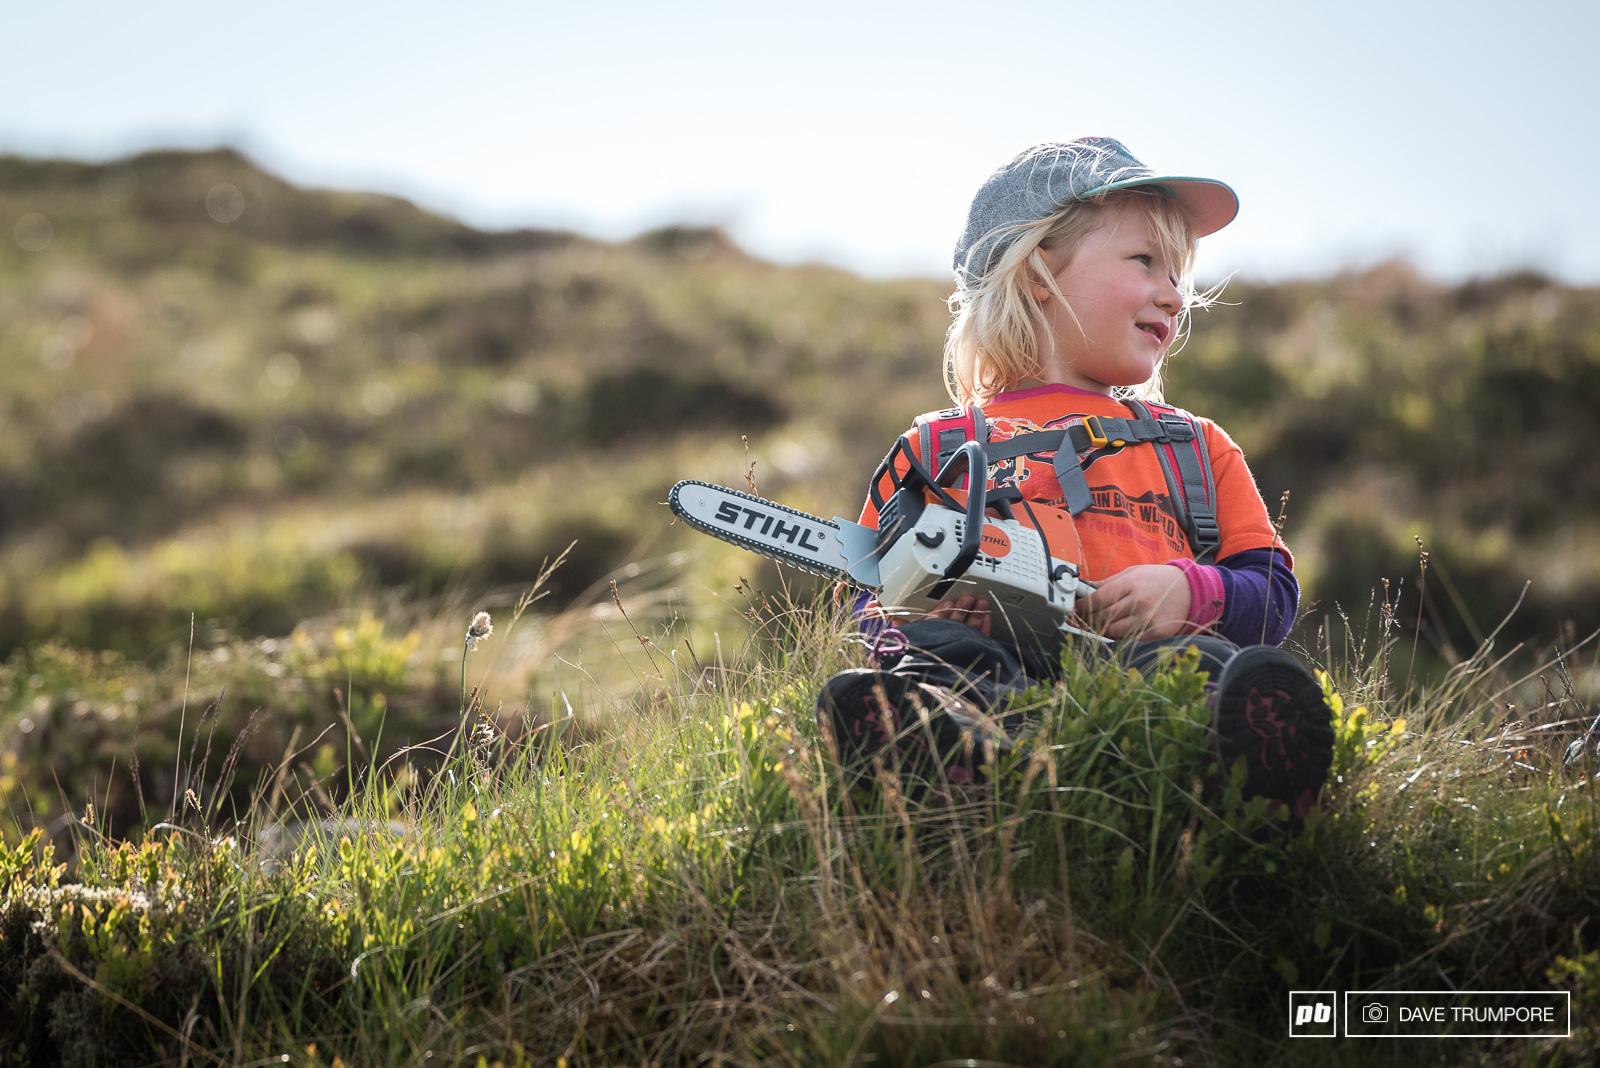 Stevie Smith inspiring the next generation.